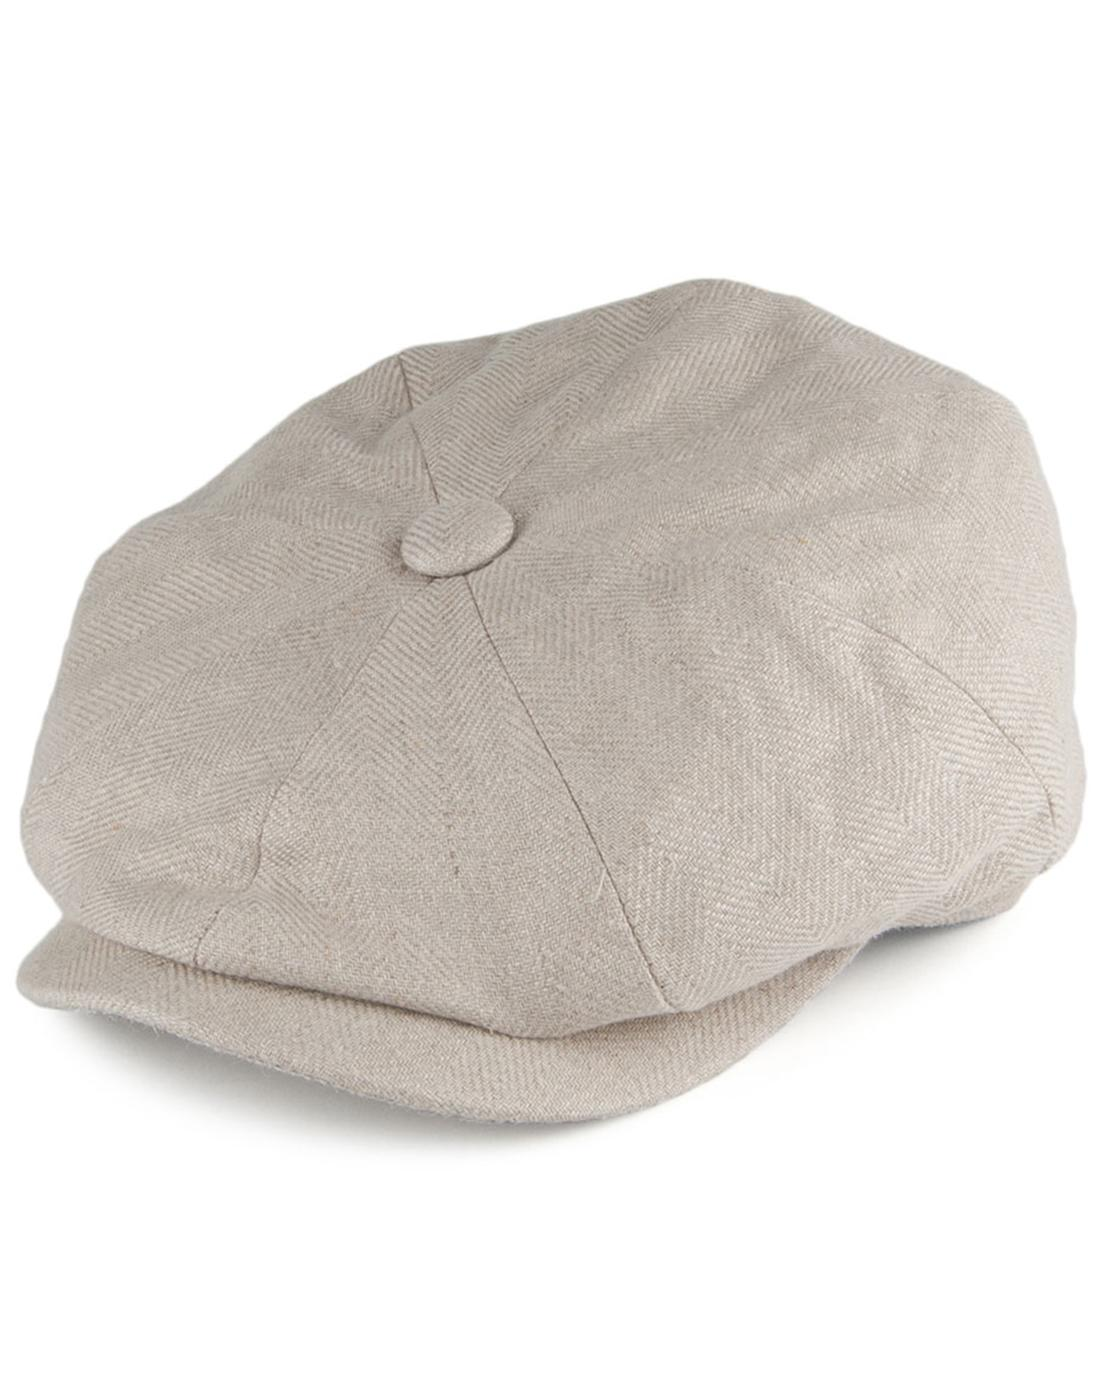 Mayo FAILSWORTH Men's Retro Irish Linen Gatsby Hat